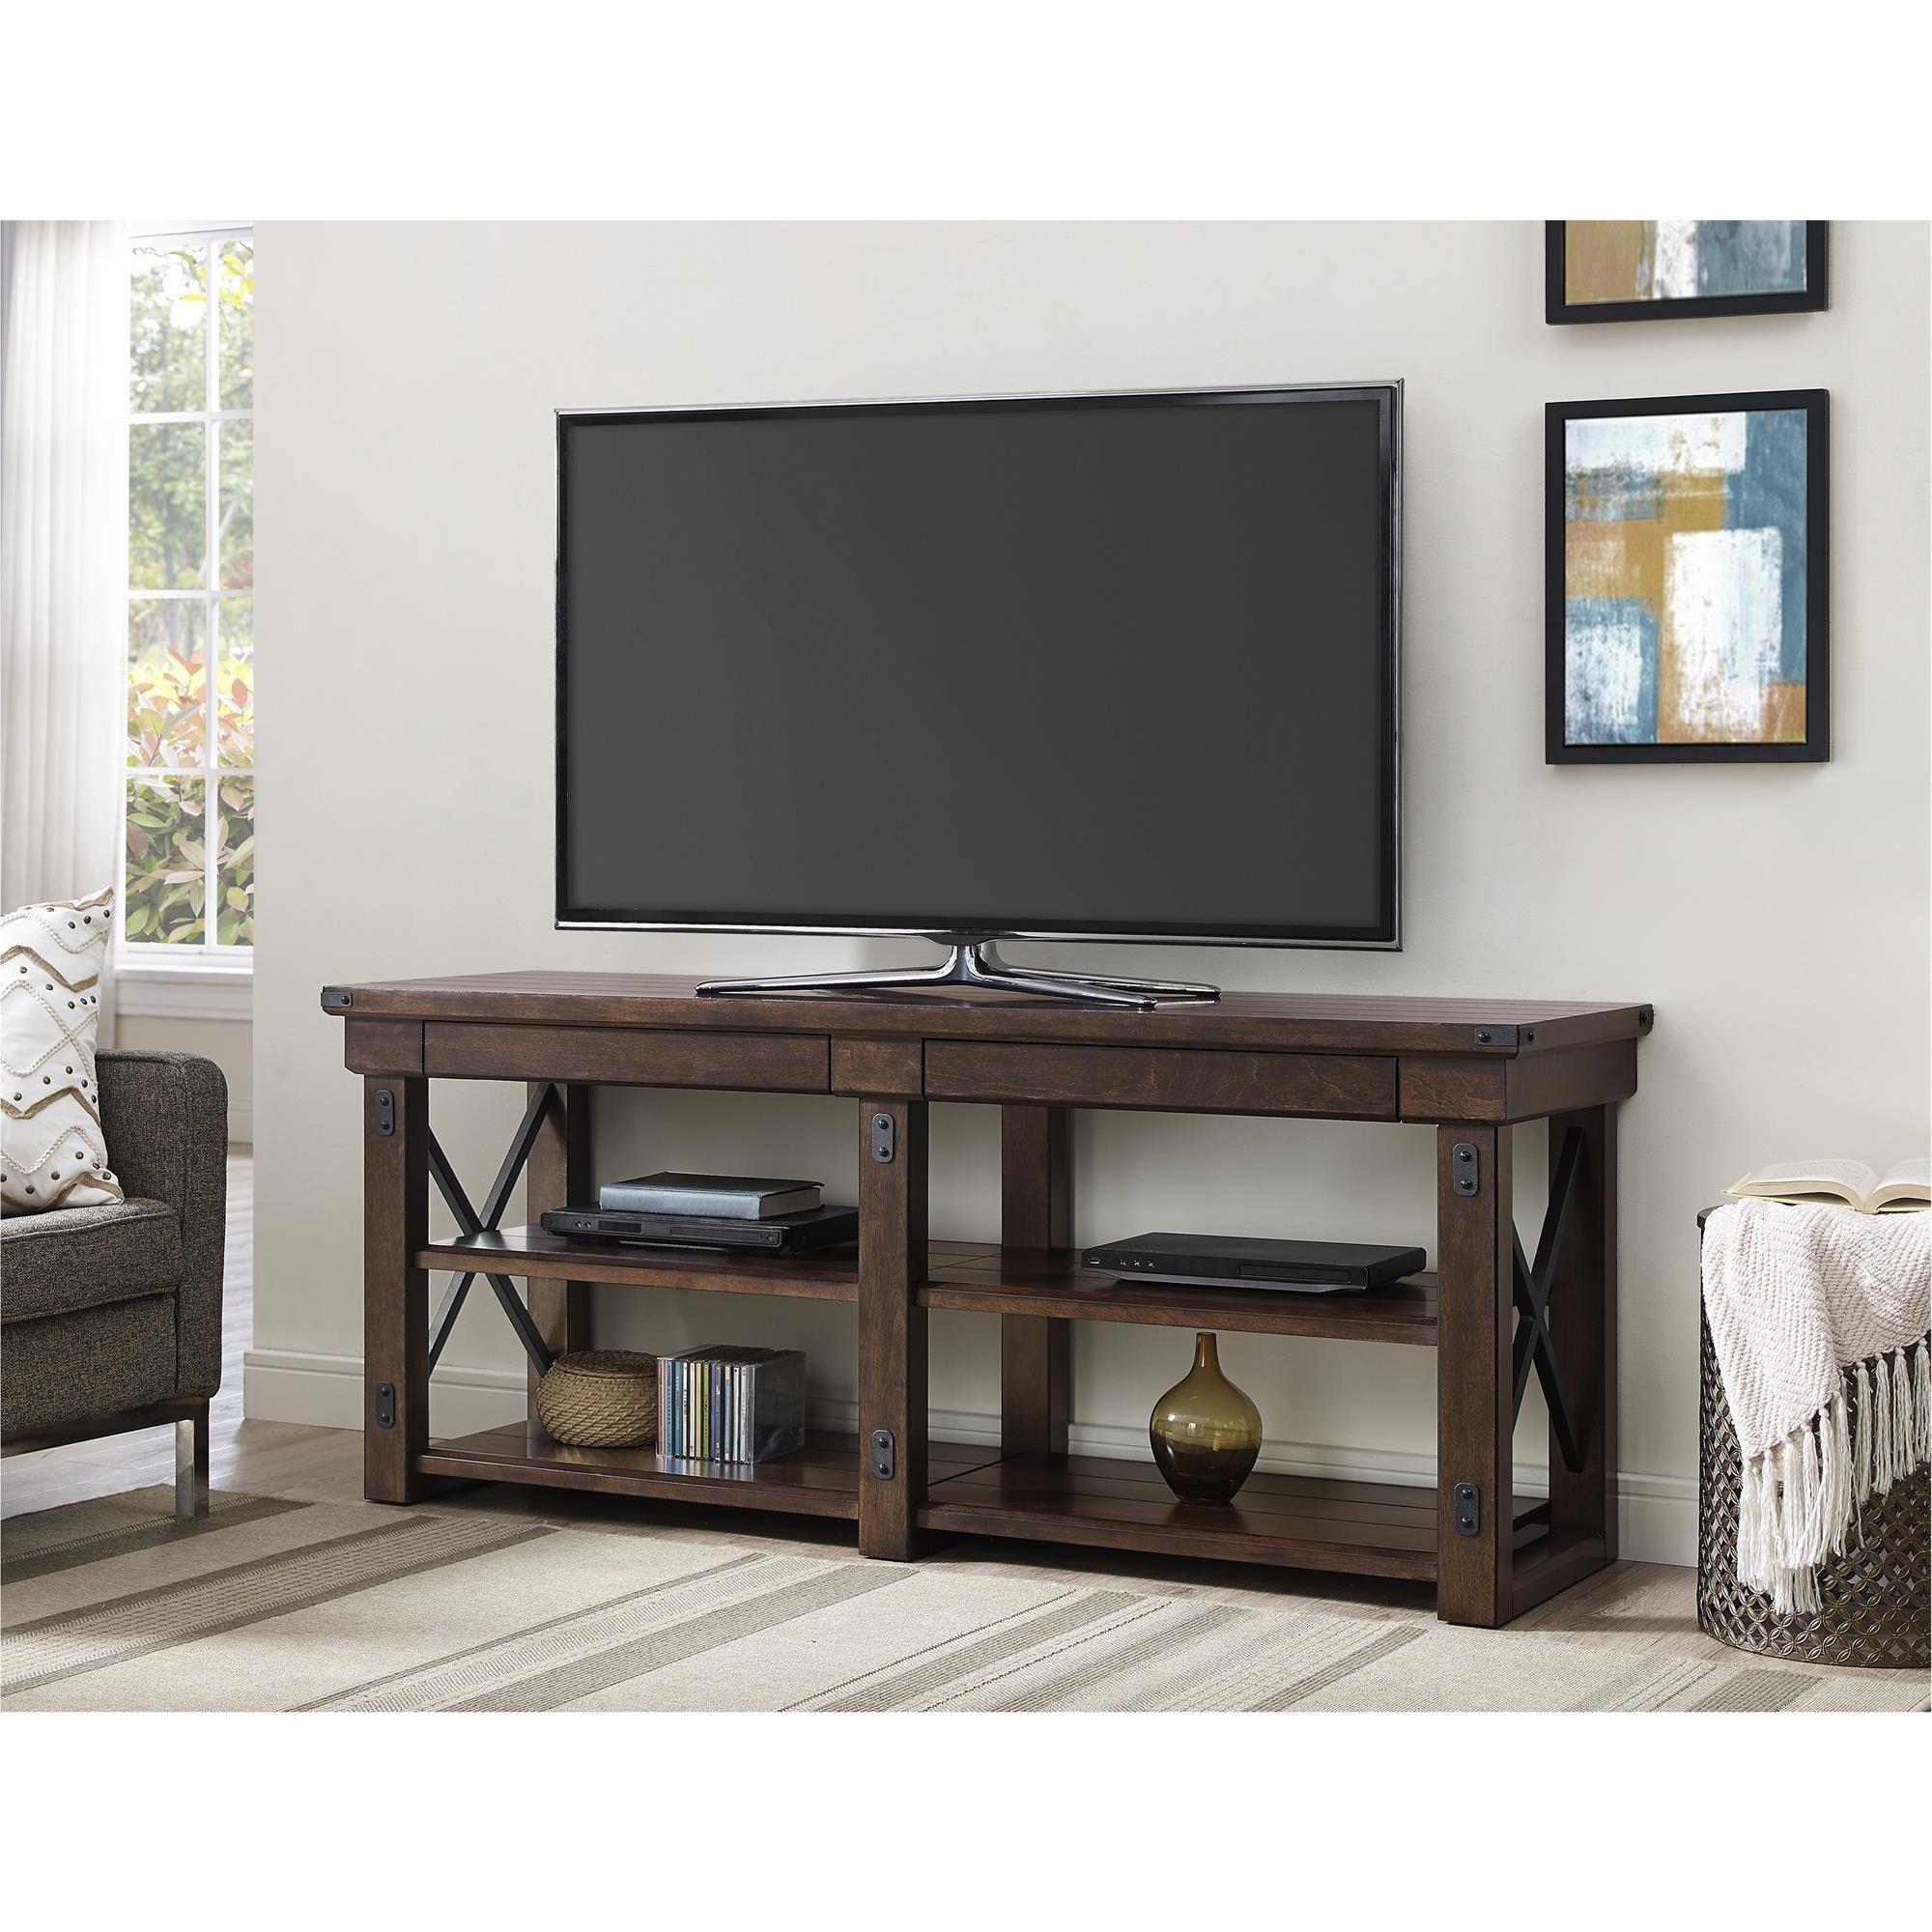 Ameriwood Home Wildwood Mahogany Veneer 65 Inch Tv Stand (65 Inch Tv Regarding Most Recent Casey Grey 74 Inch Tv Stands (View 2 of 20)